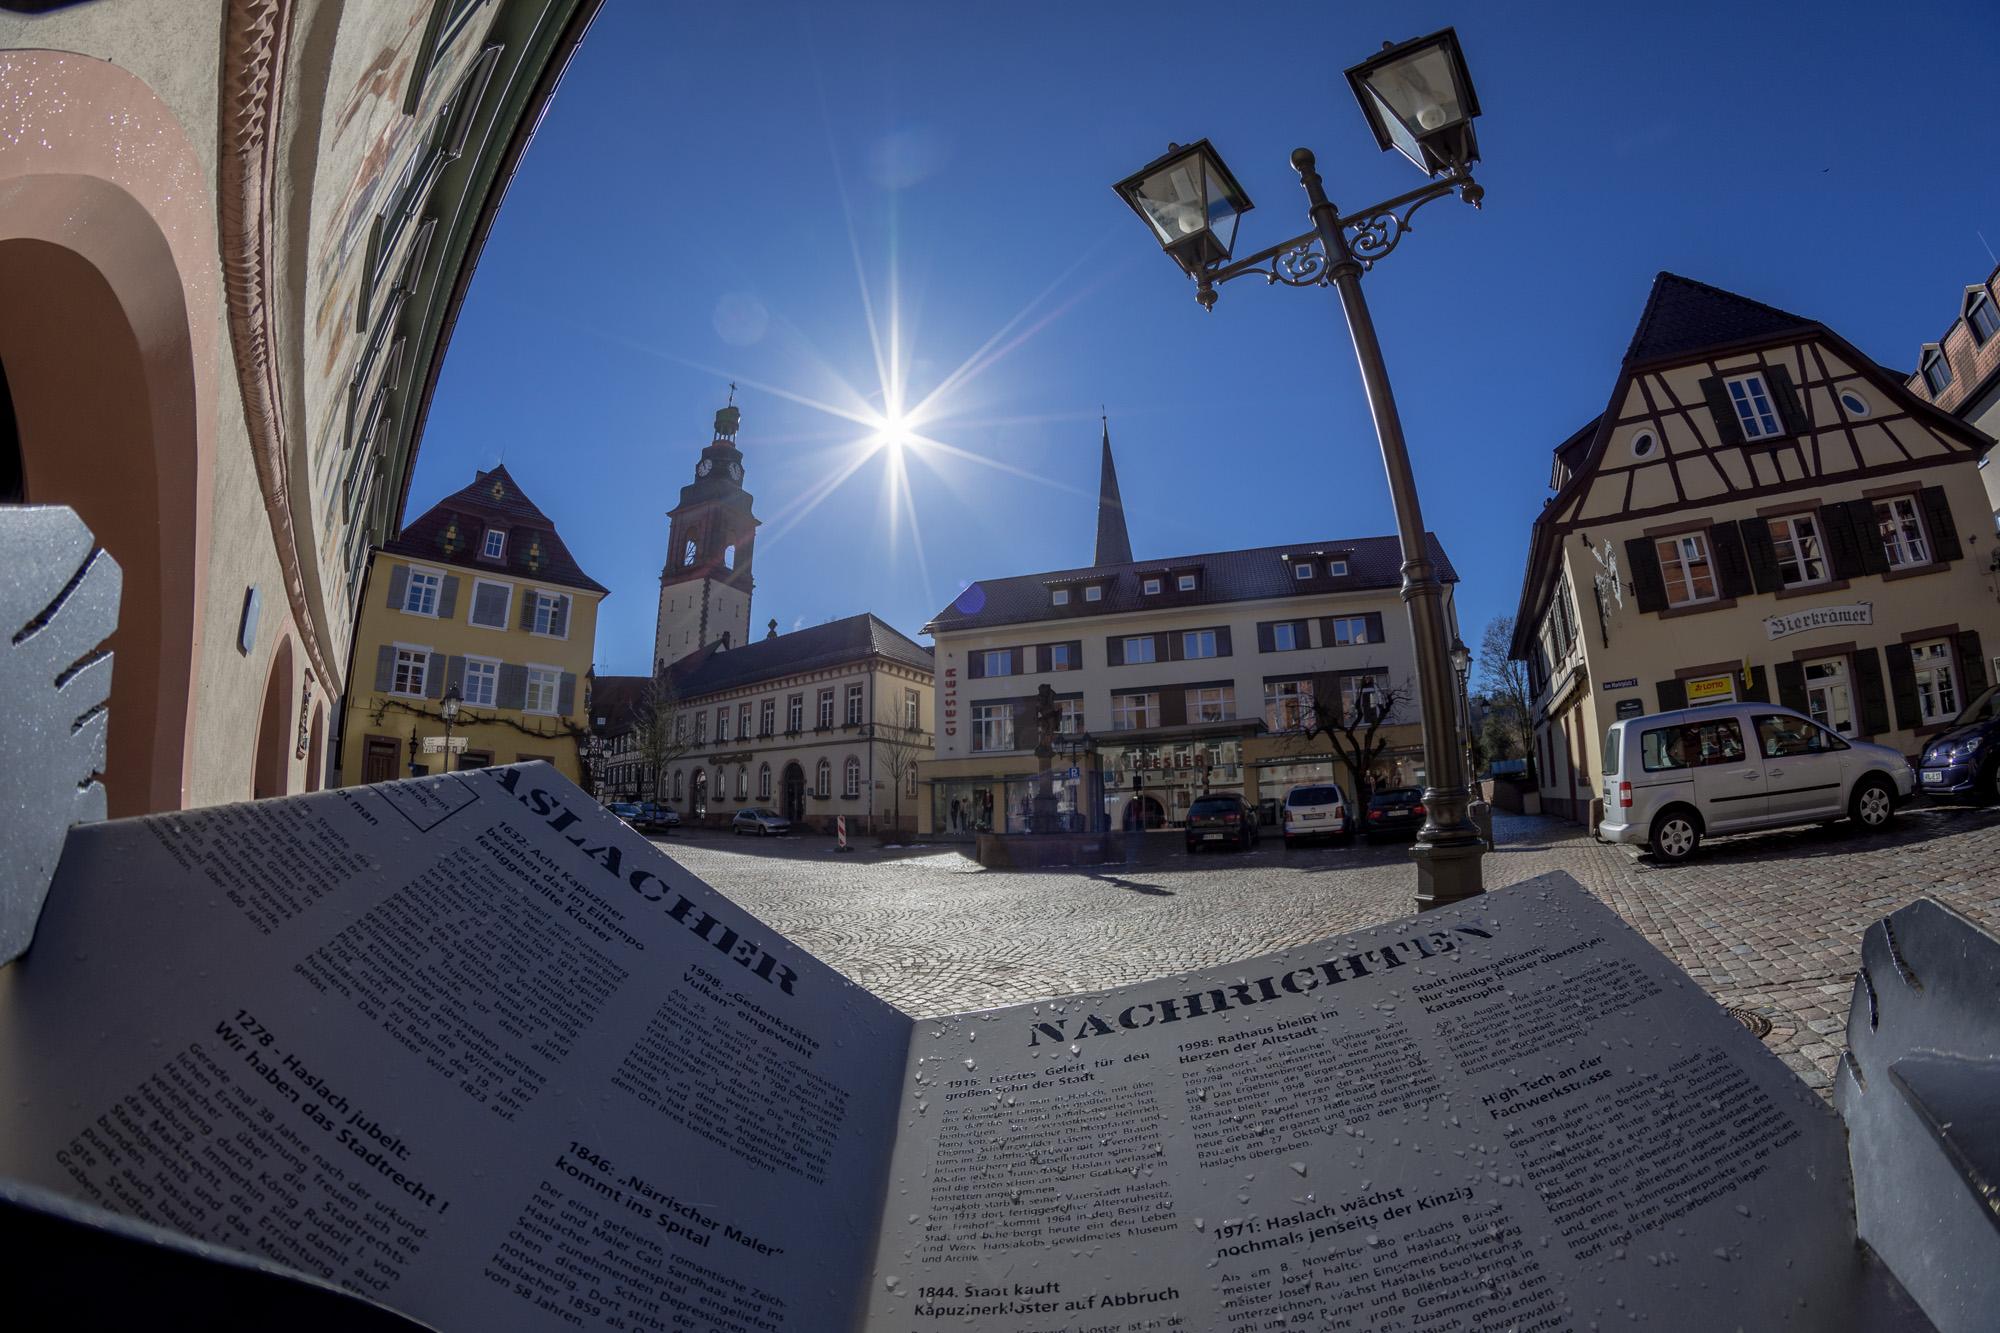 Zeitungsleser am Marktplatz